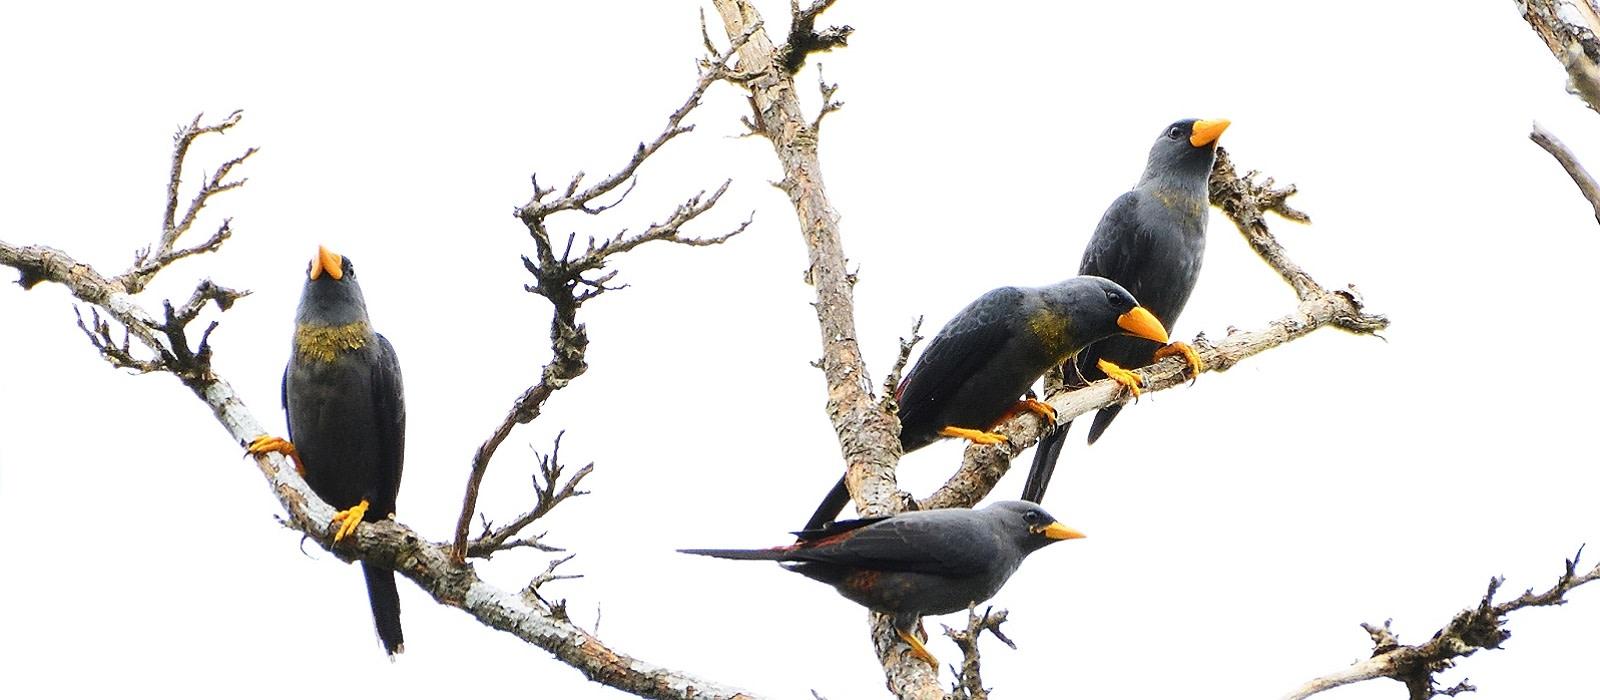 Reiseziel Tangkoko Batuangus Naturschutzgebiet Indonesien